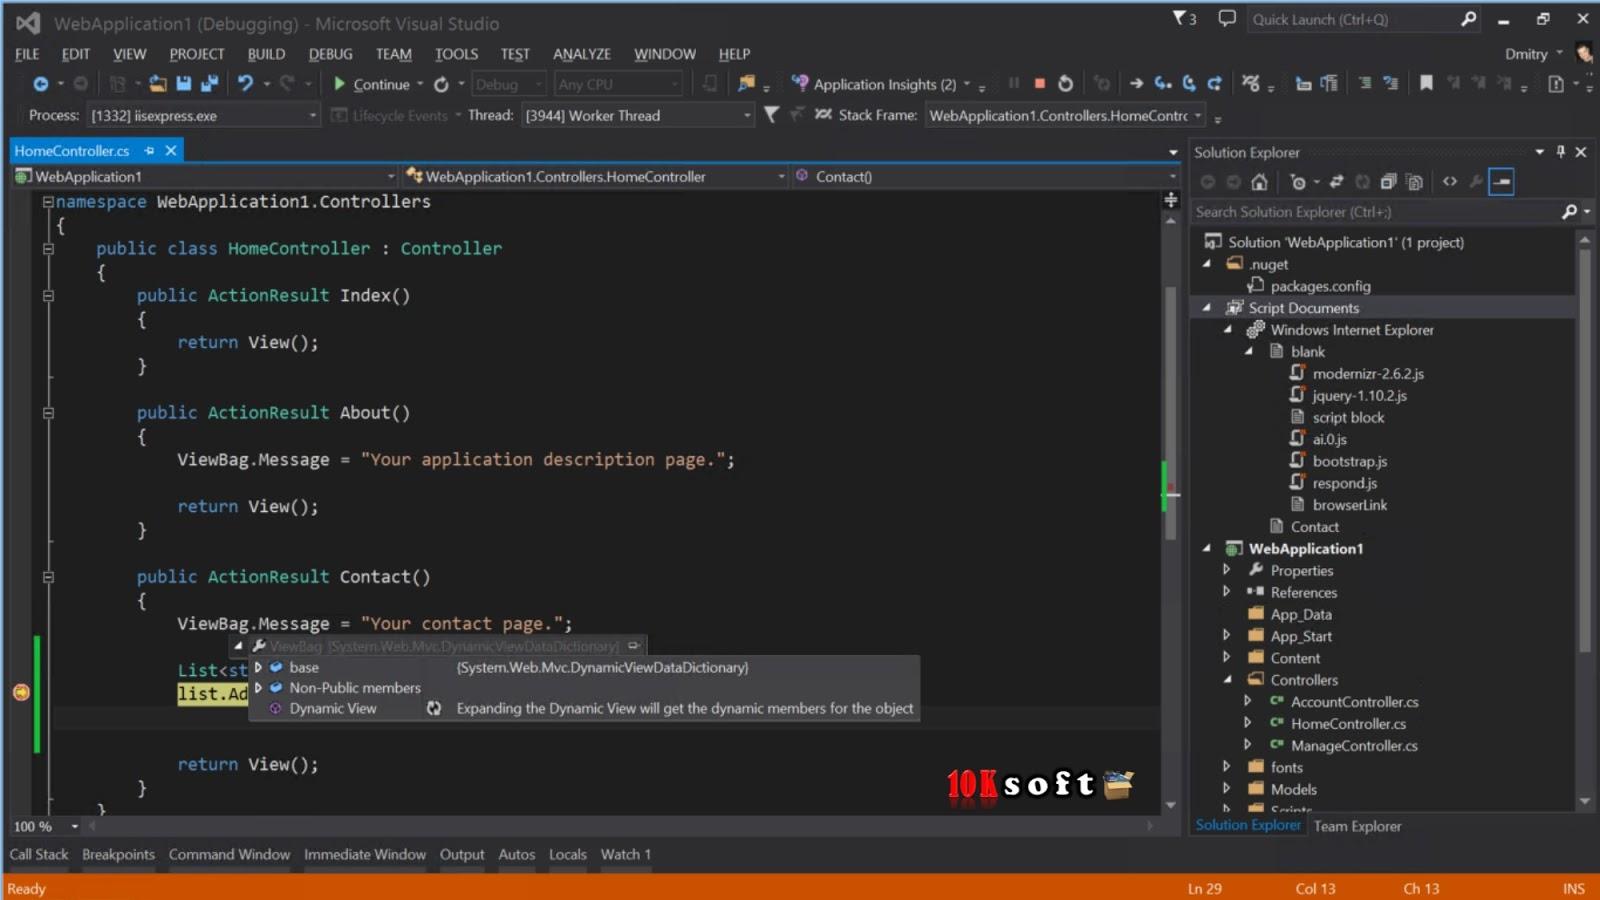 Microsoft Visual Studio 2013 Ultimate Free Download